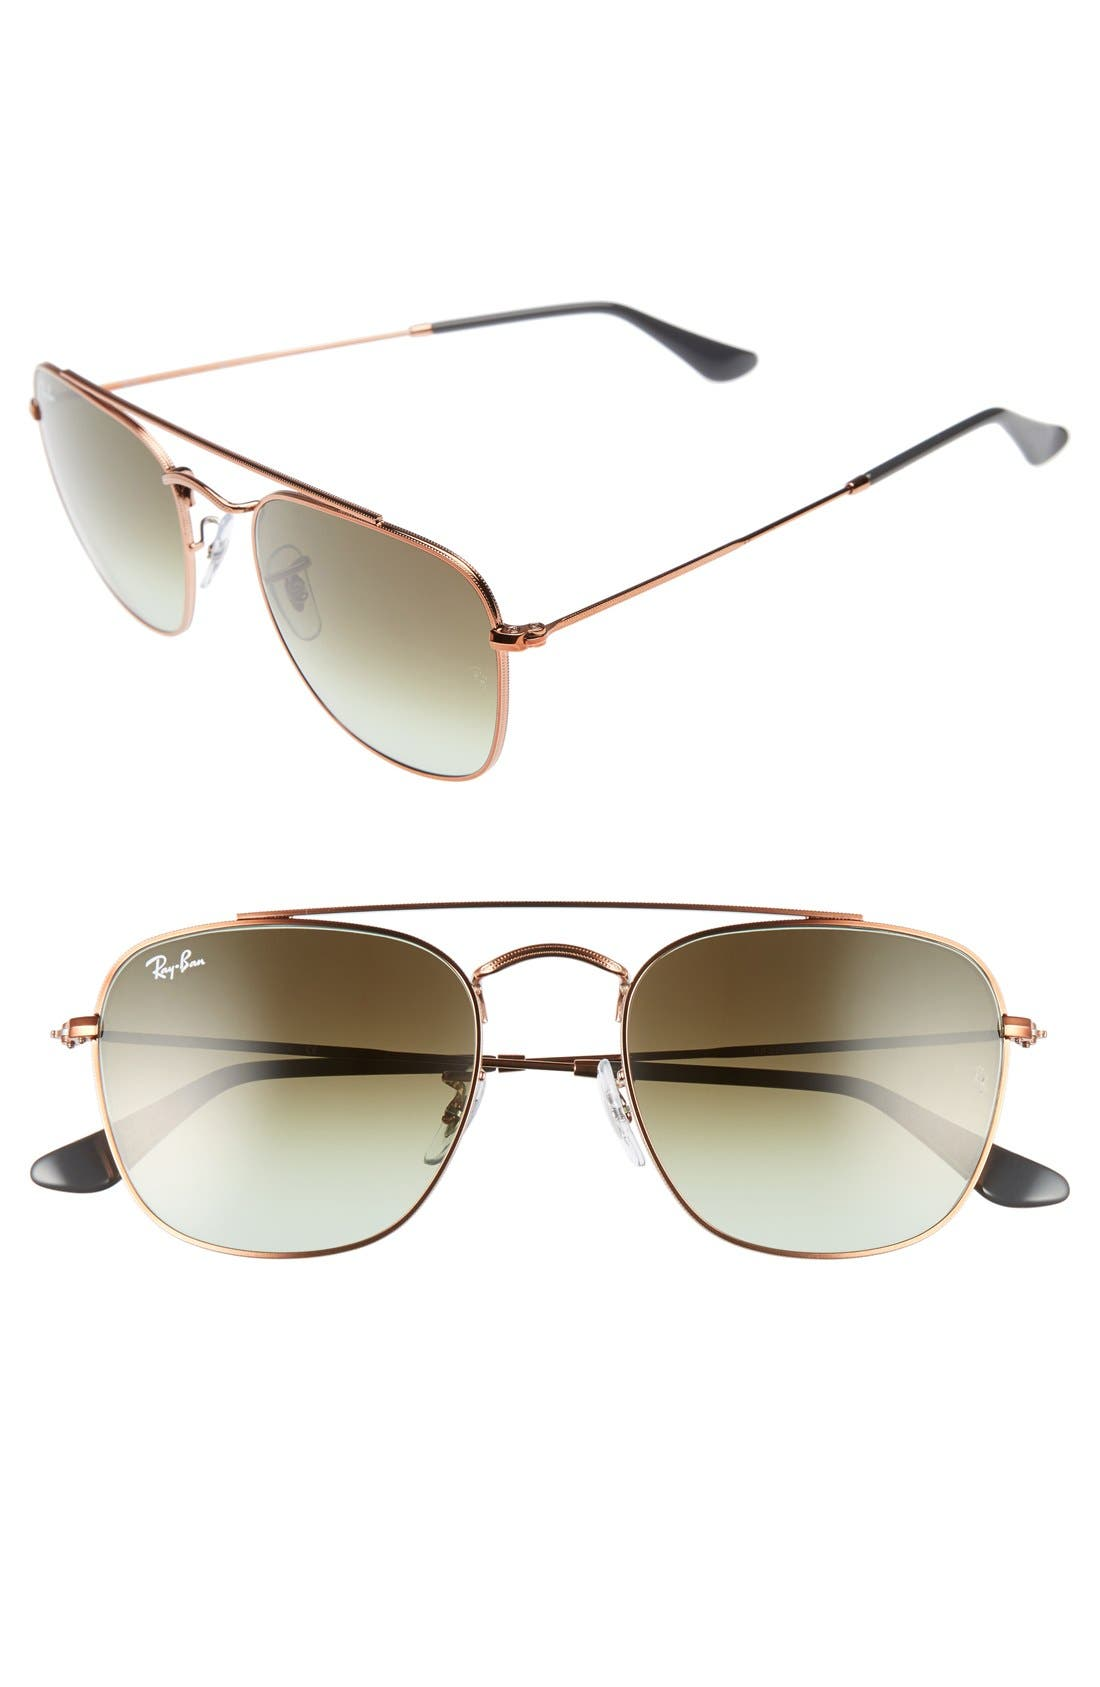 Main Image - Ray-Ban Icons 54mm Aviator Sunglasses